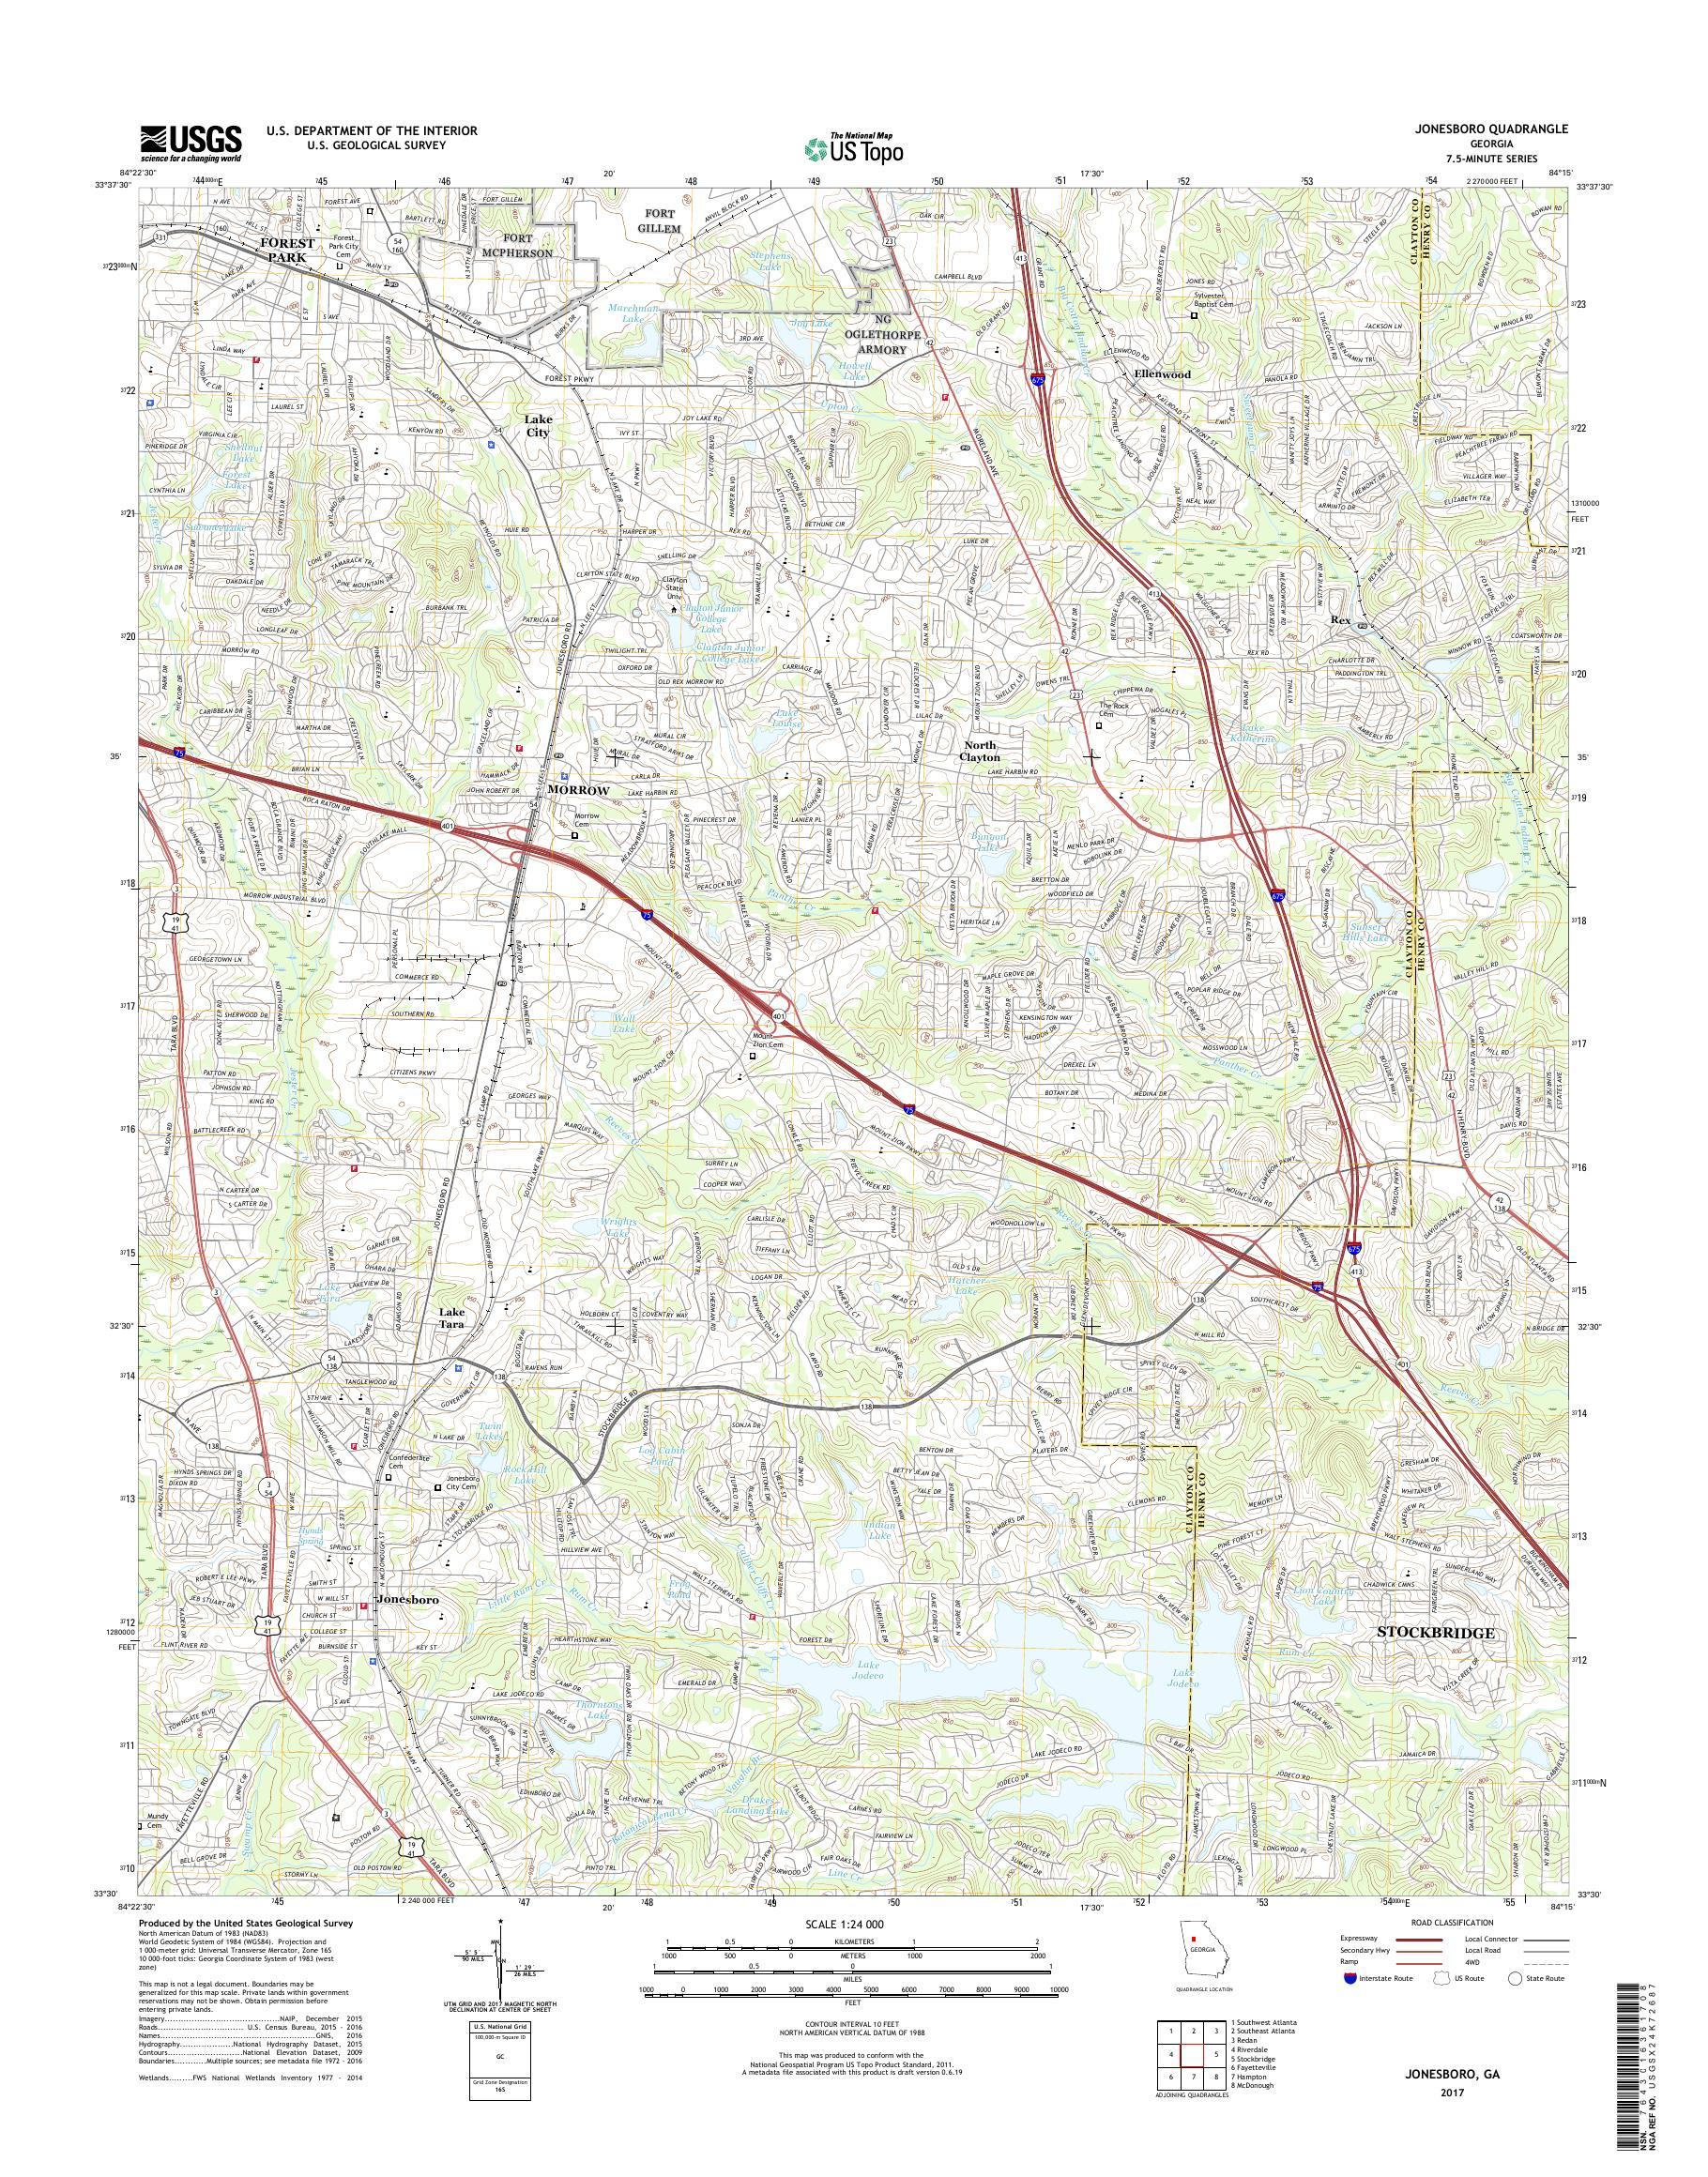 Map Of Jonesboro Georgia.Mytopo Jonesboro Georgia Usgs Quad Topo Map